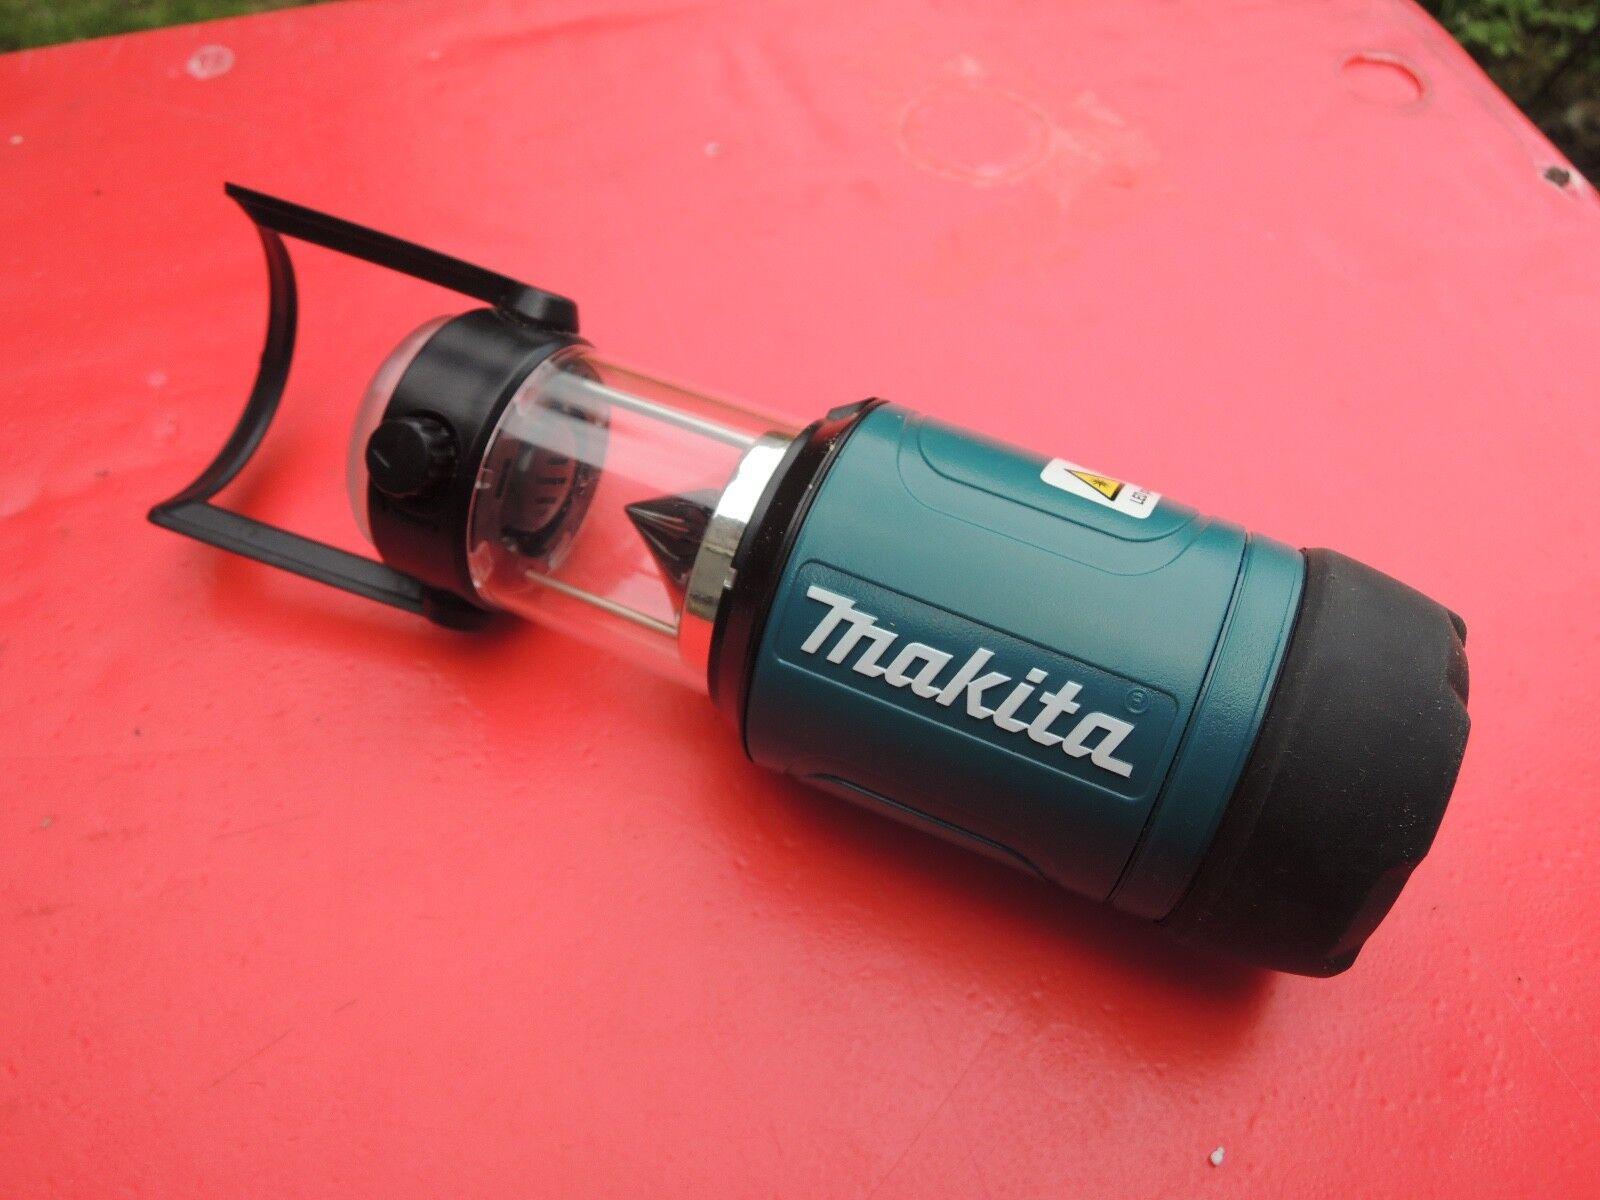 MAKITA LAMPE ML 102 ETANCHE TORCHE et LANTERNE batterie 10,8V Bricolage Camping